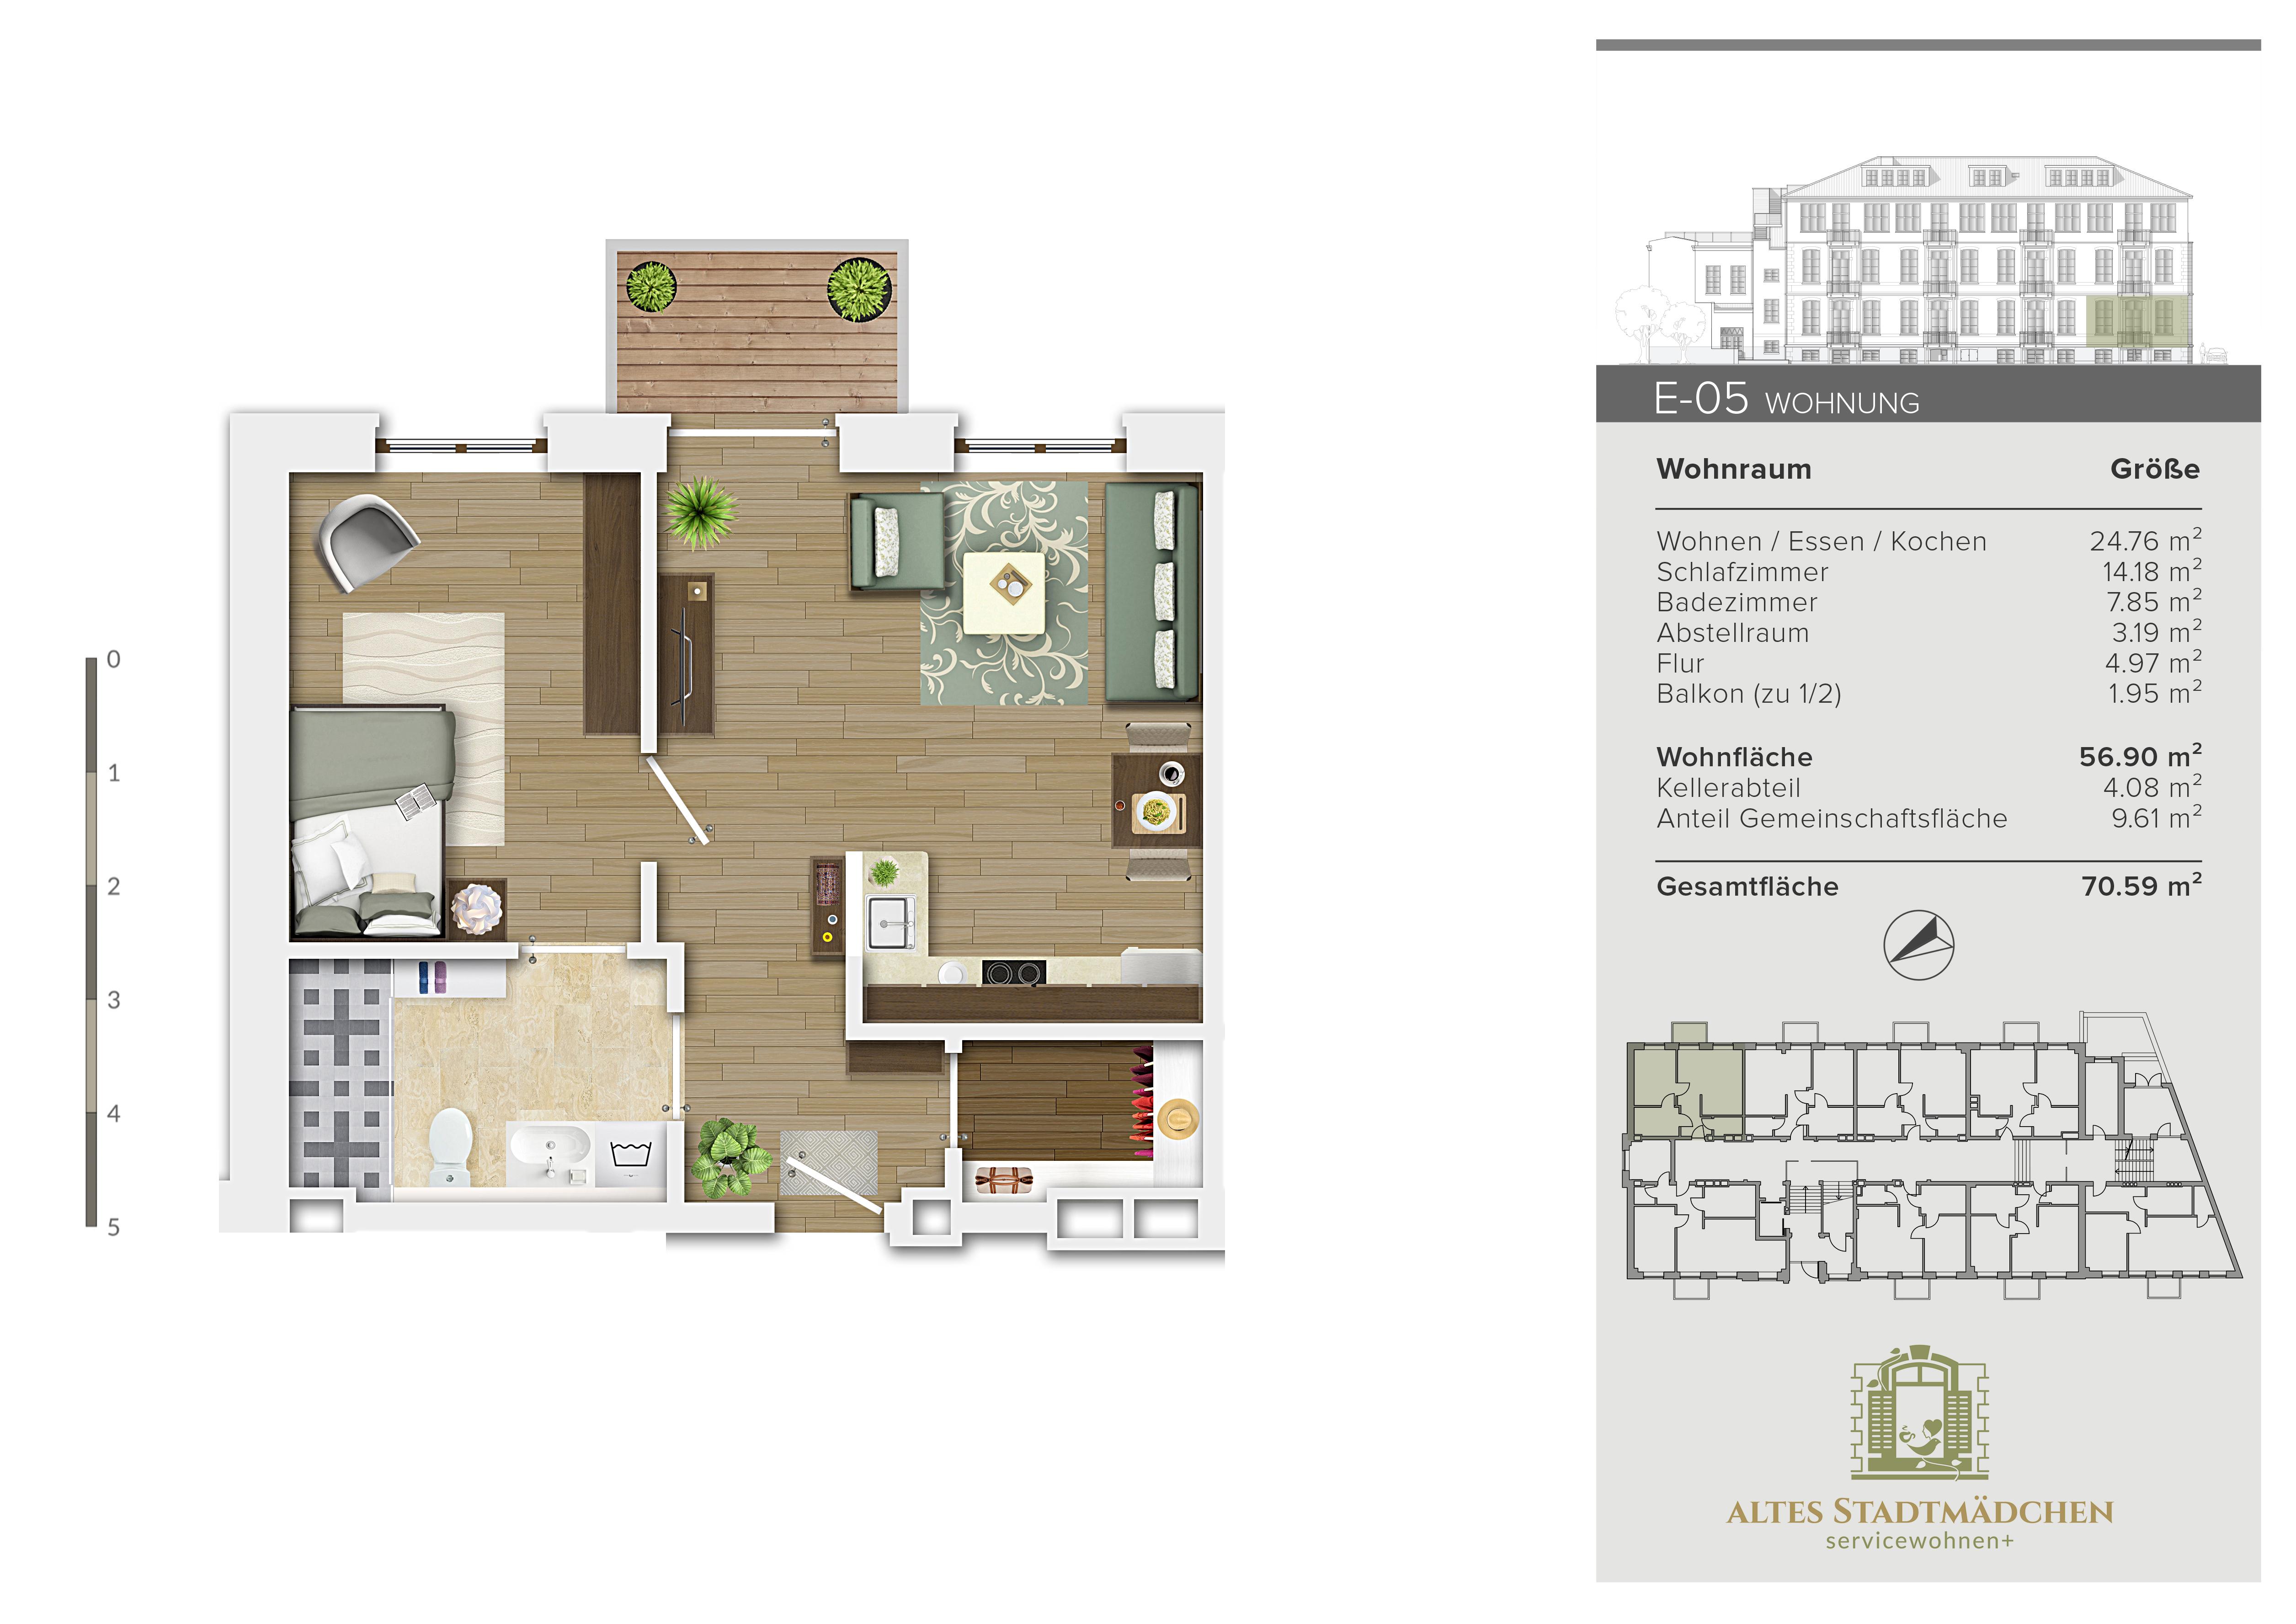 Wohnung E-05